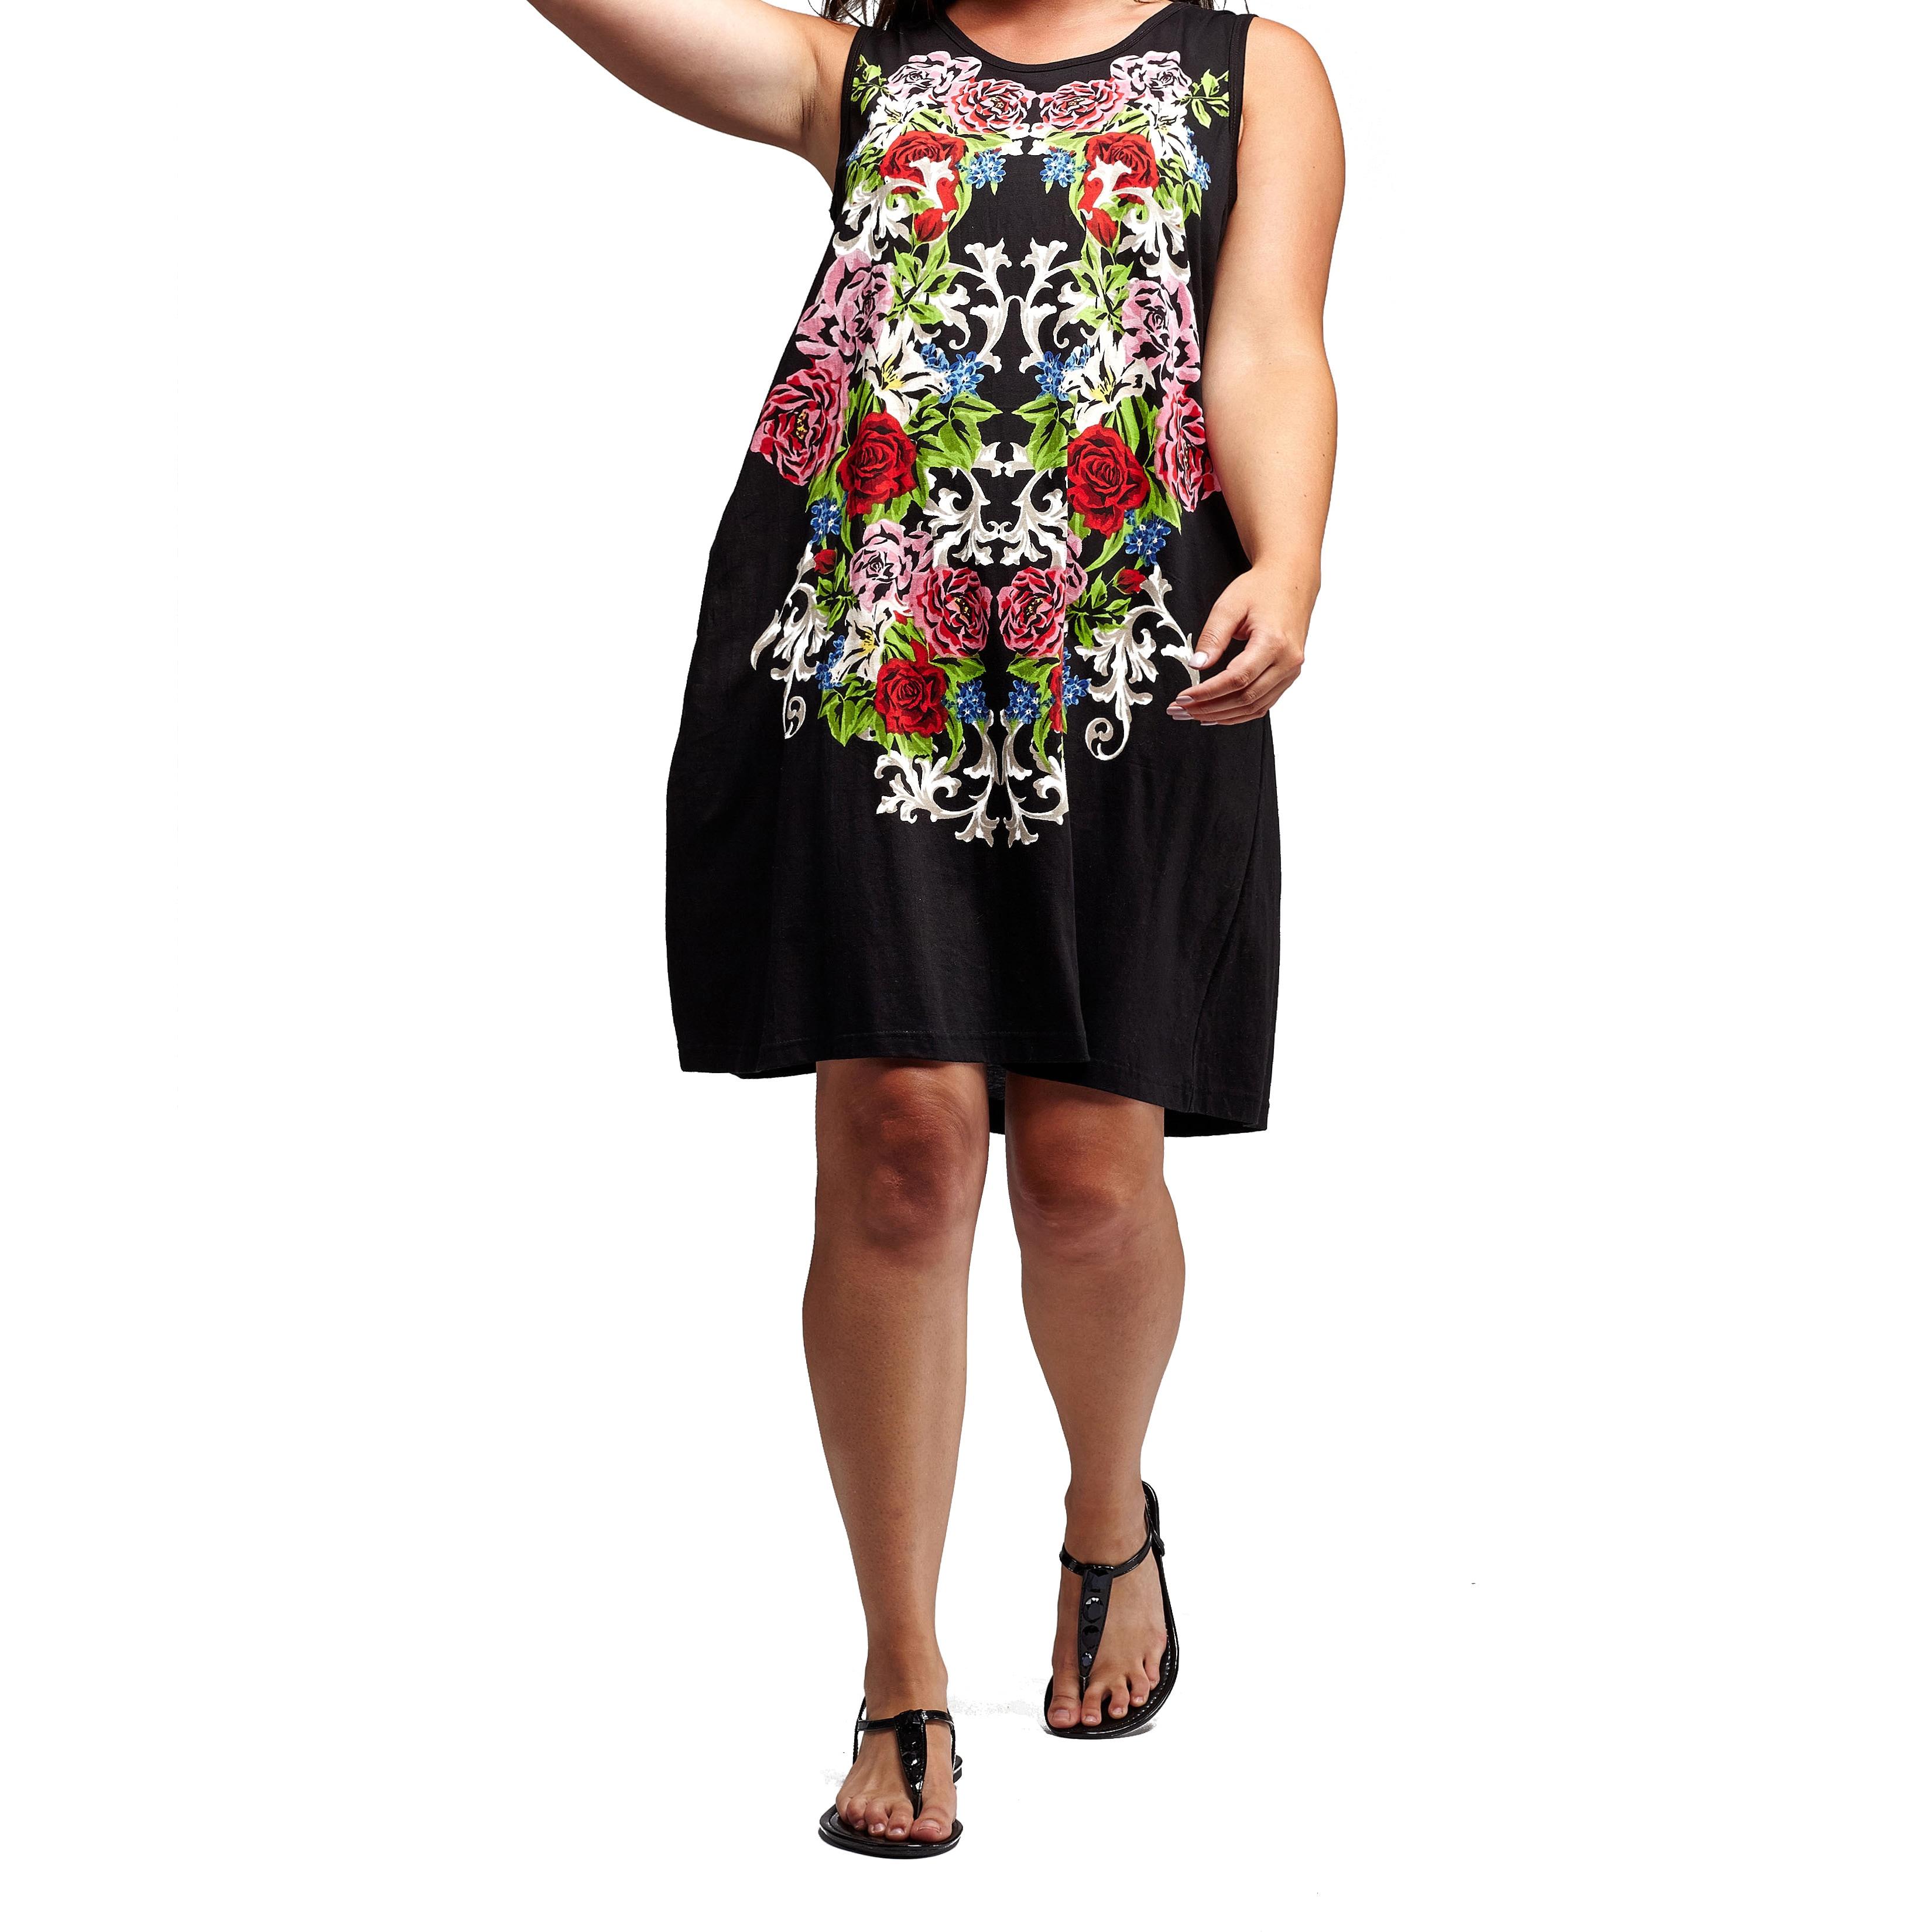 La Cera Women\'s Black Cotton Knit Plus-size Sleeveless Dress | eBay